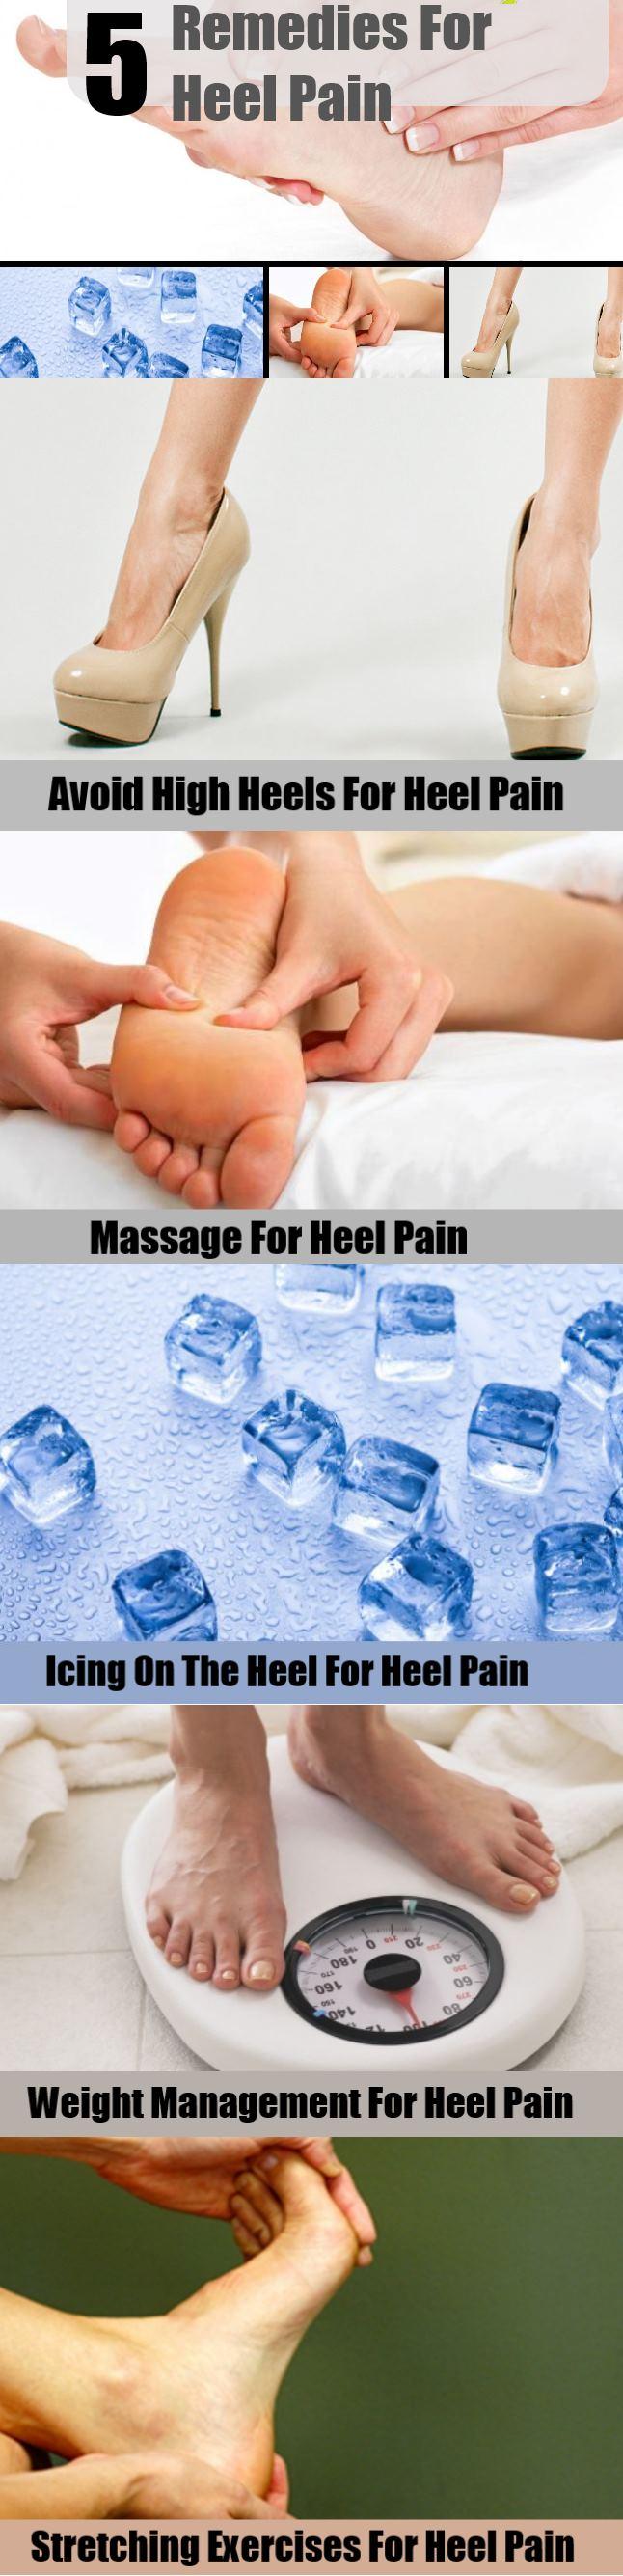 Remedies For Heel Pain